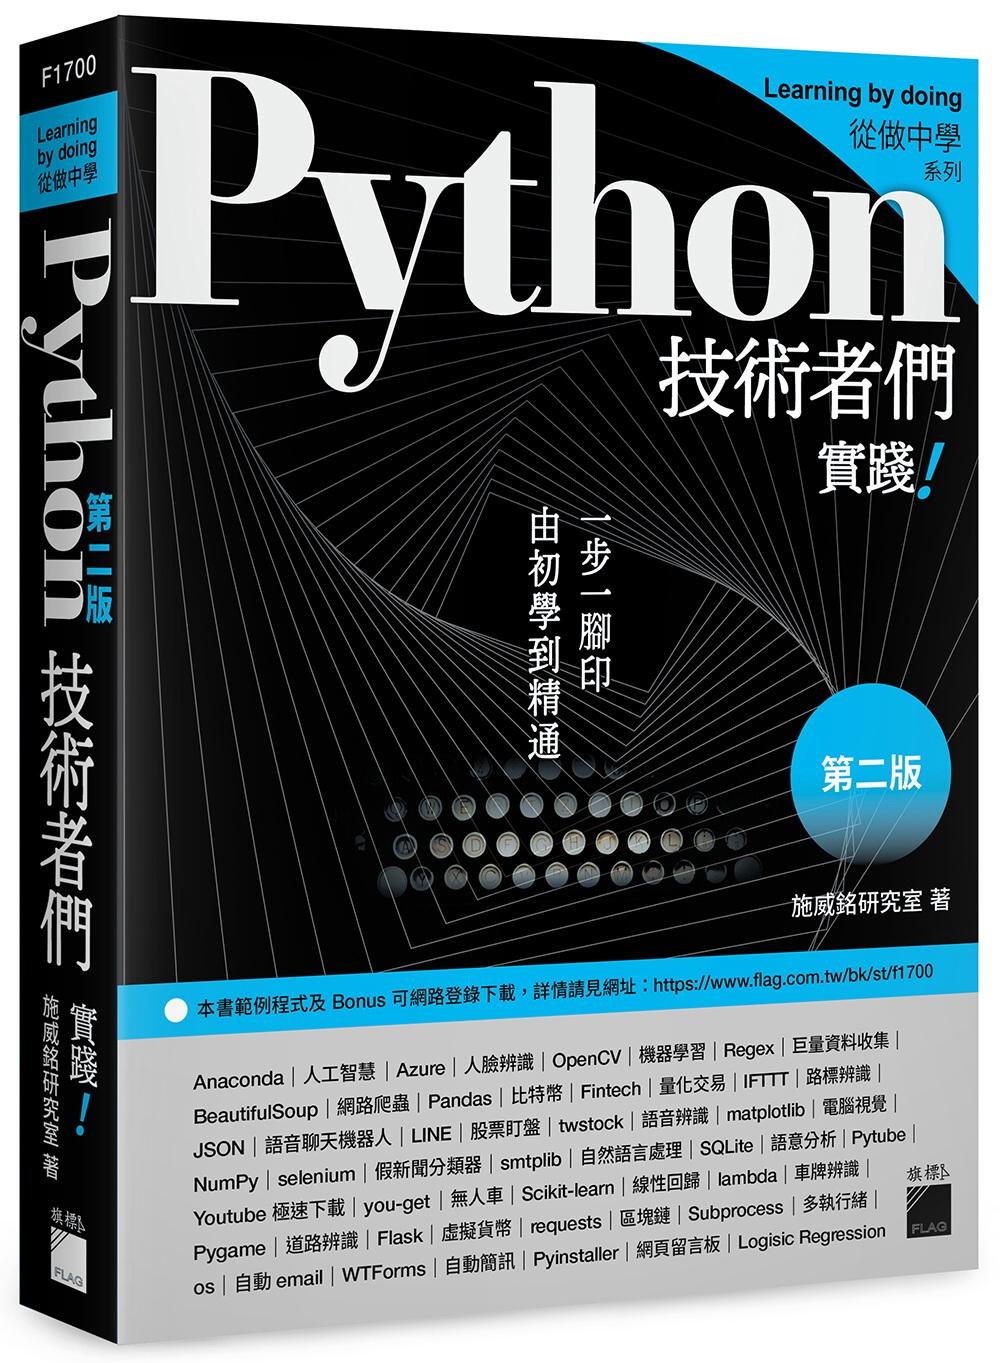 Python 技術者們:實踐!...